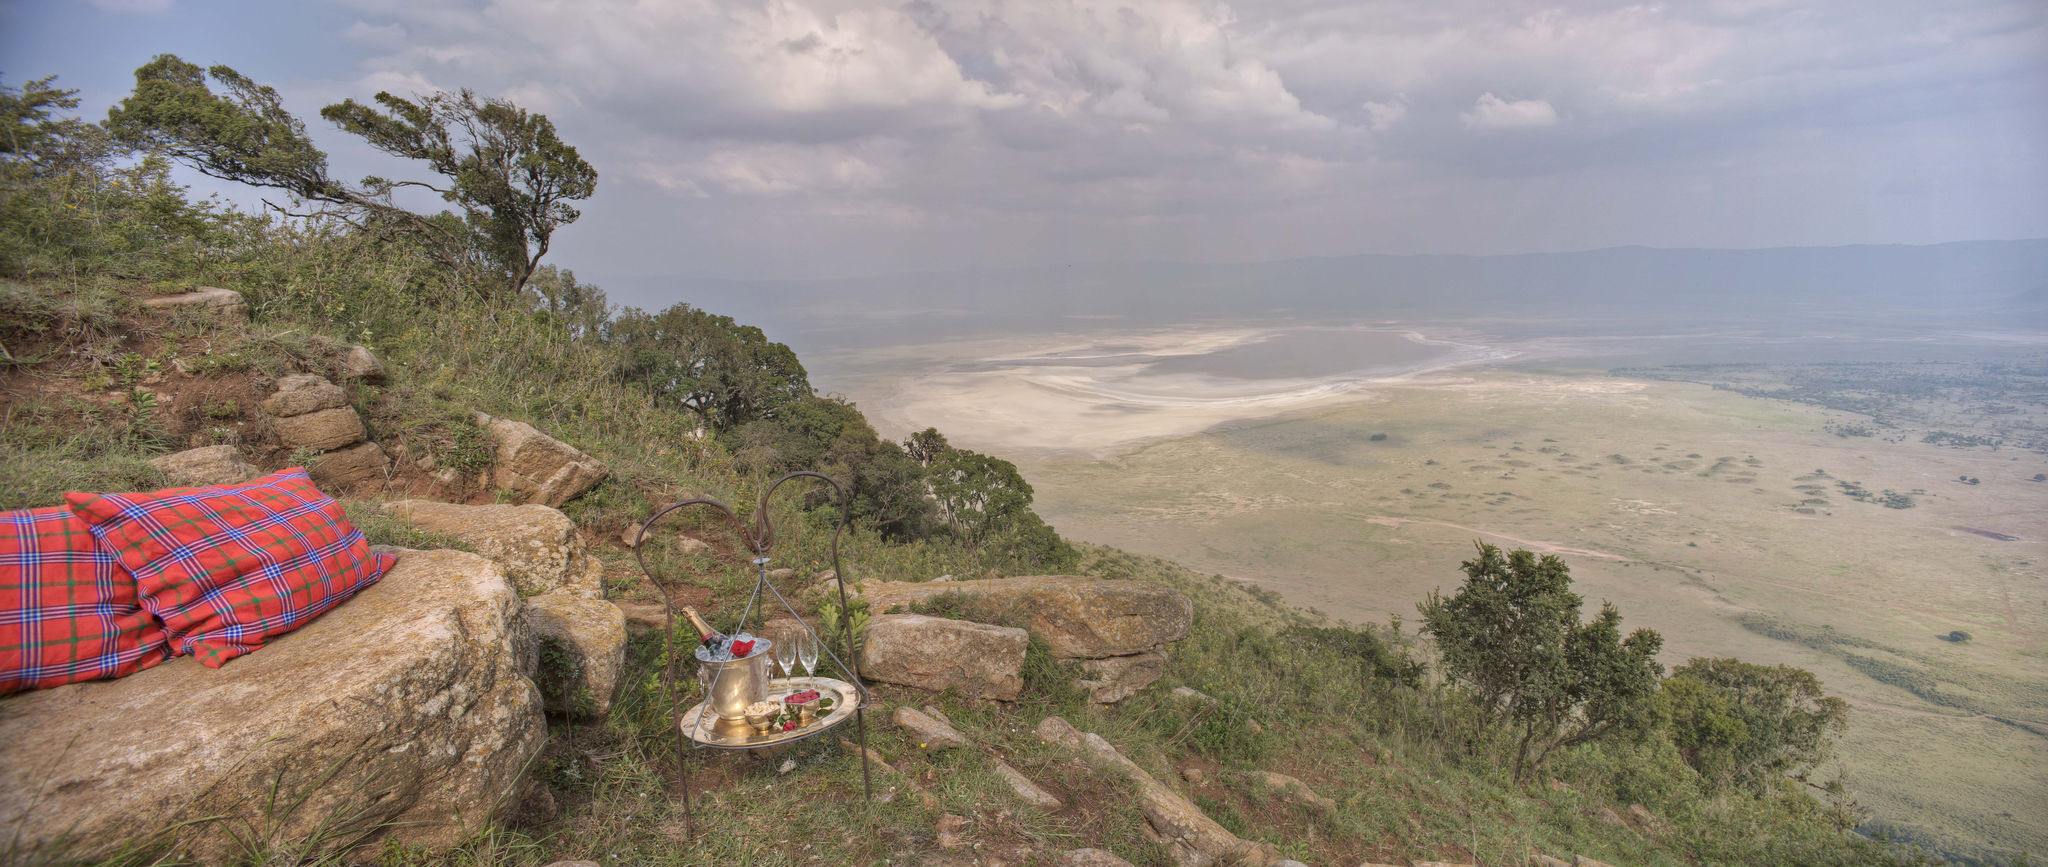 View of Ngorongoro Crater from the Ngorongoro Lodge